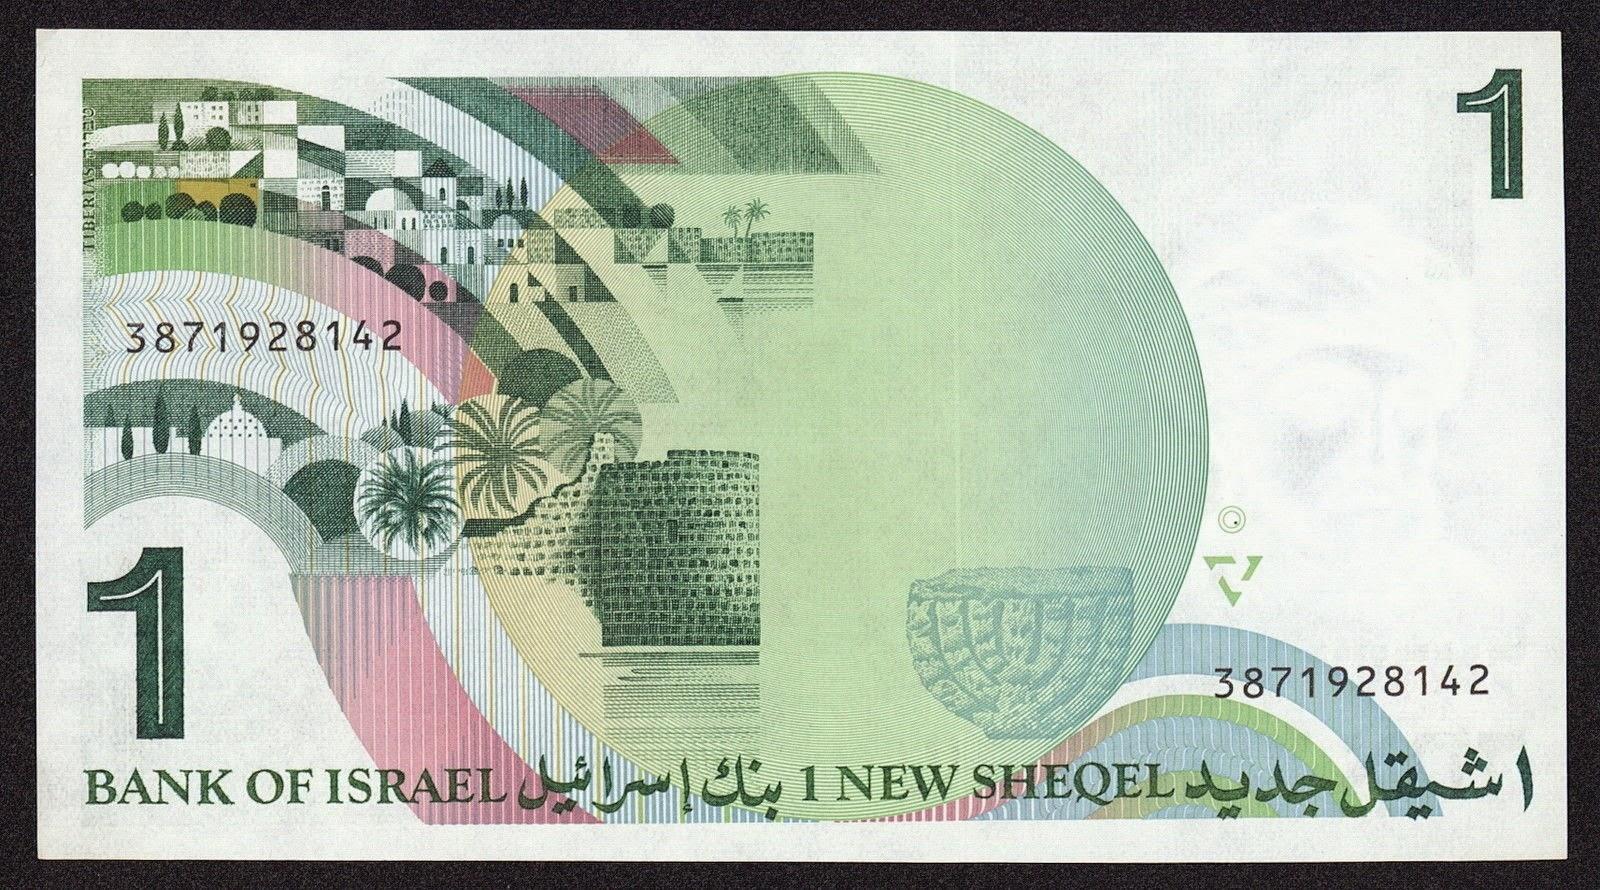 Israeli currency 1 New Shekel banknote 1986 Bank of Israel